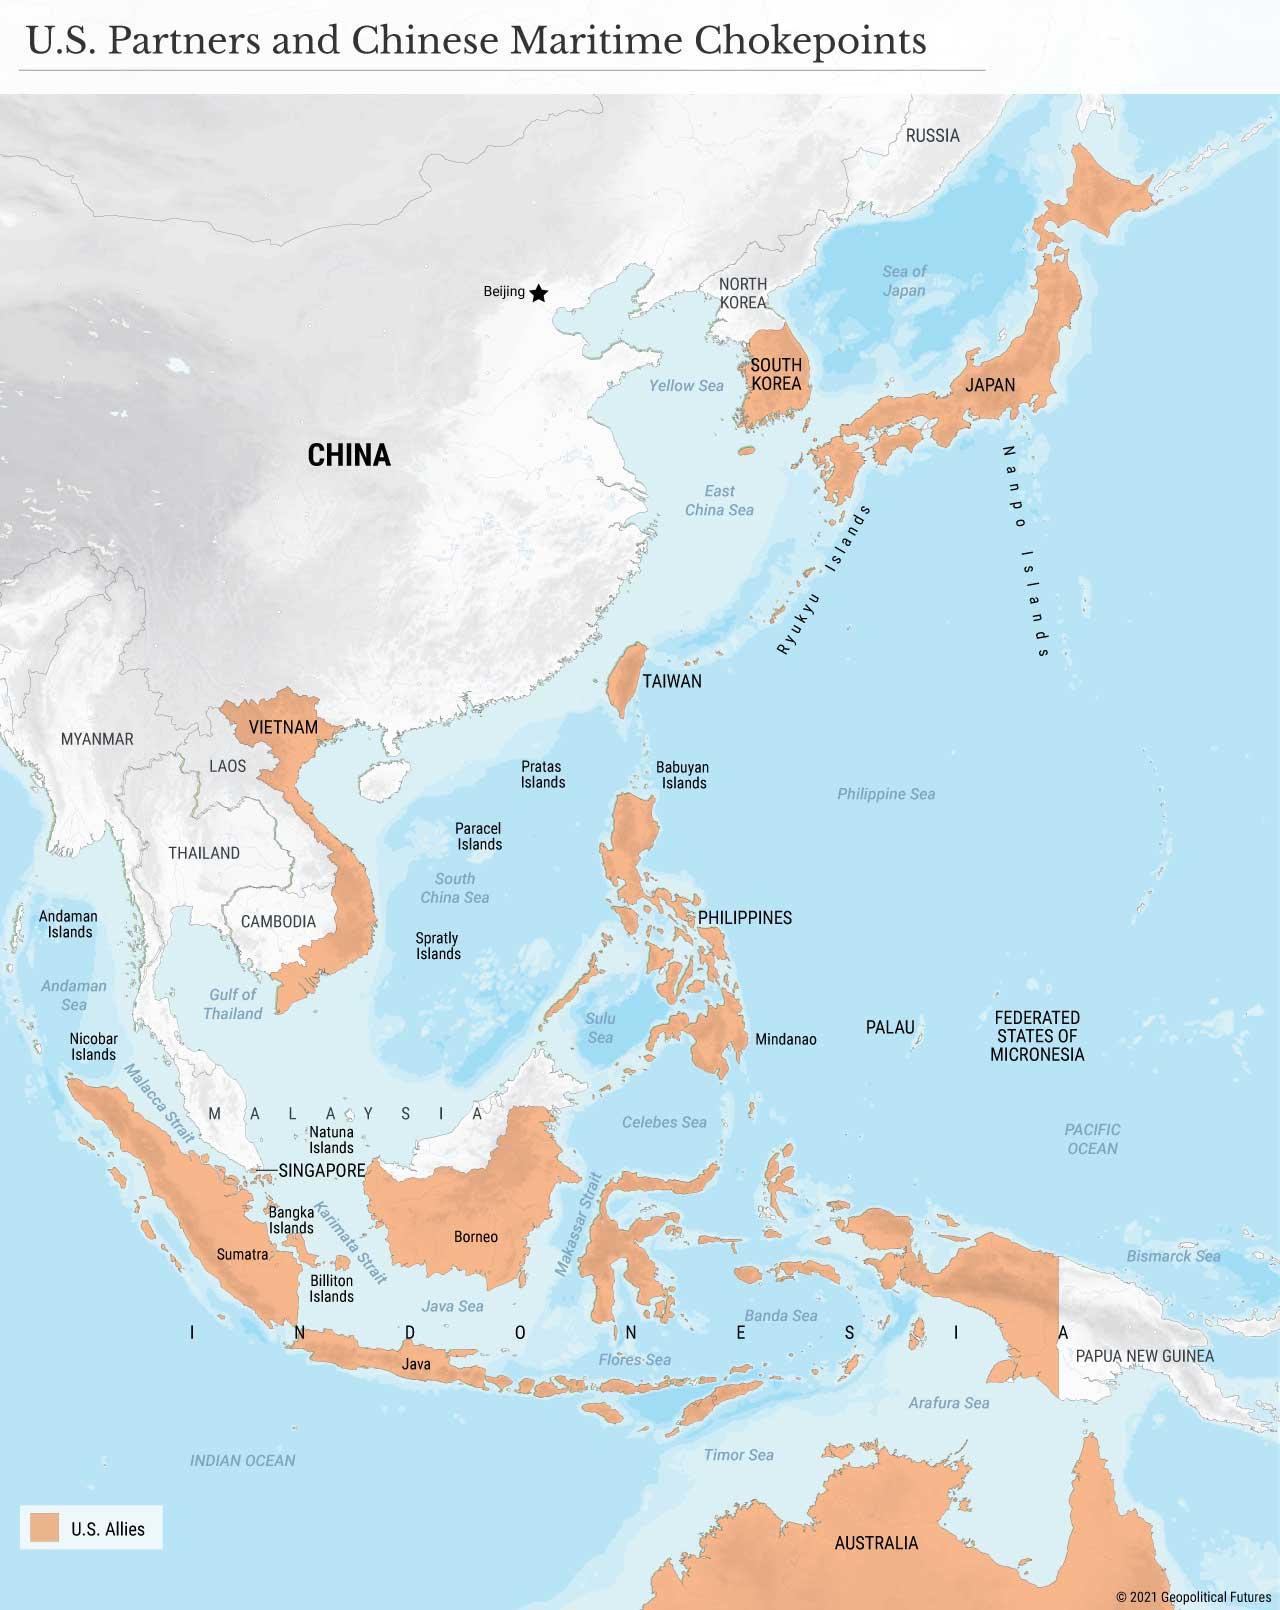 Partner statunitensi e Chokepoint marittimi cinesi